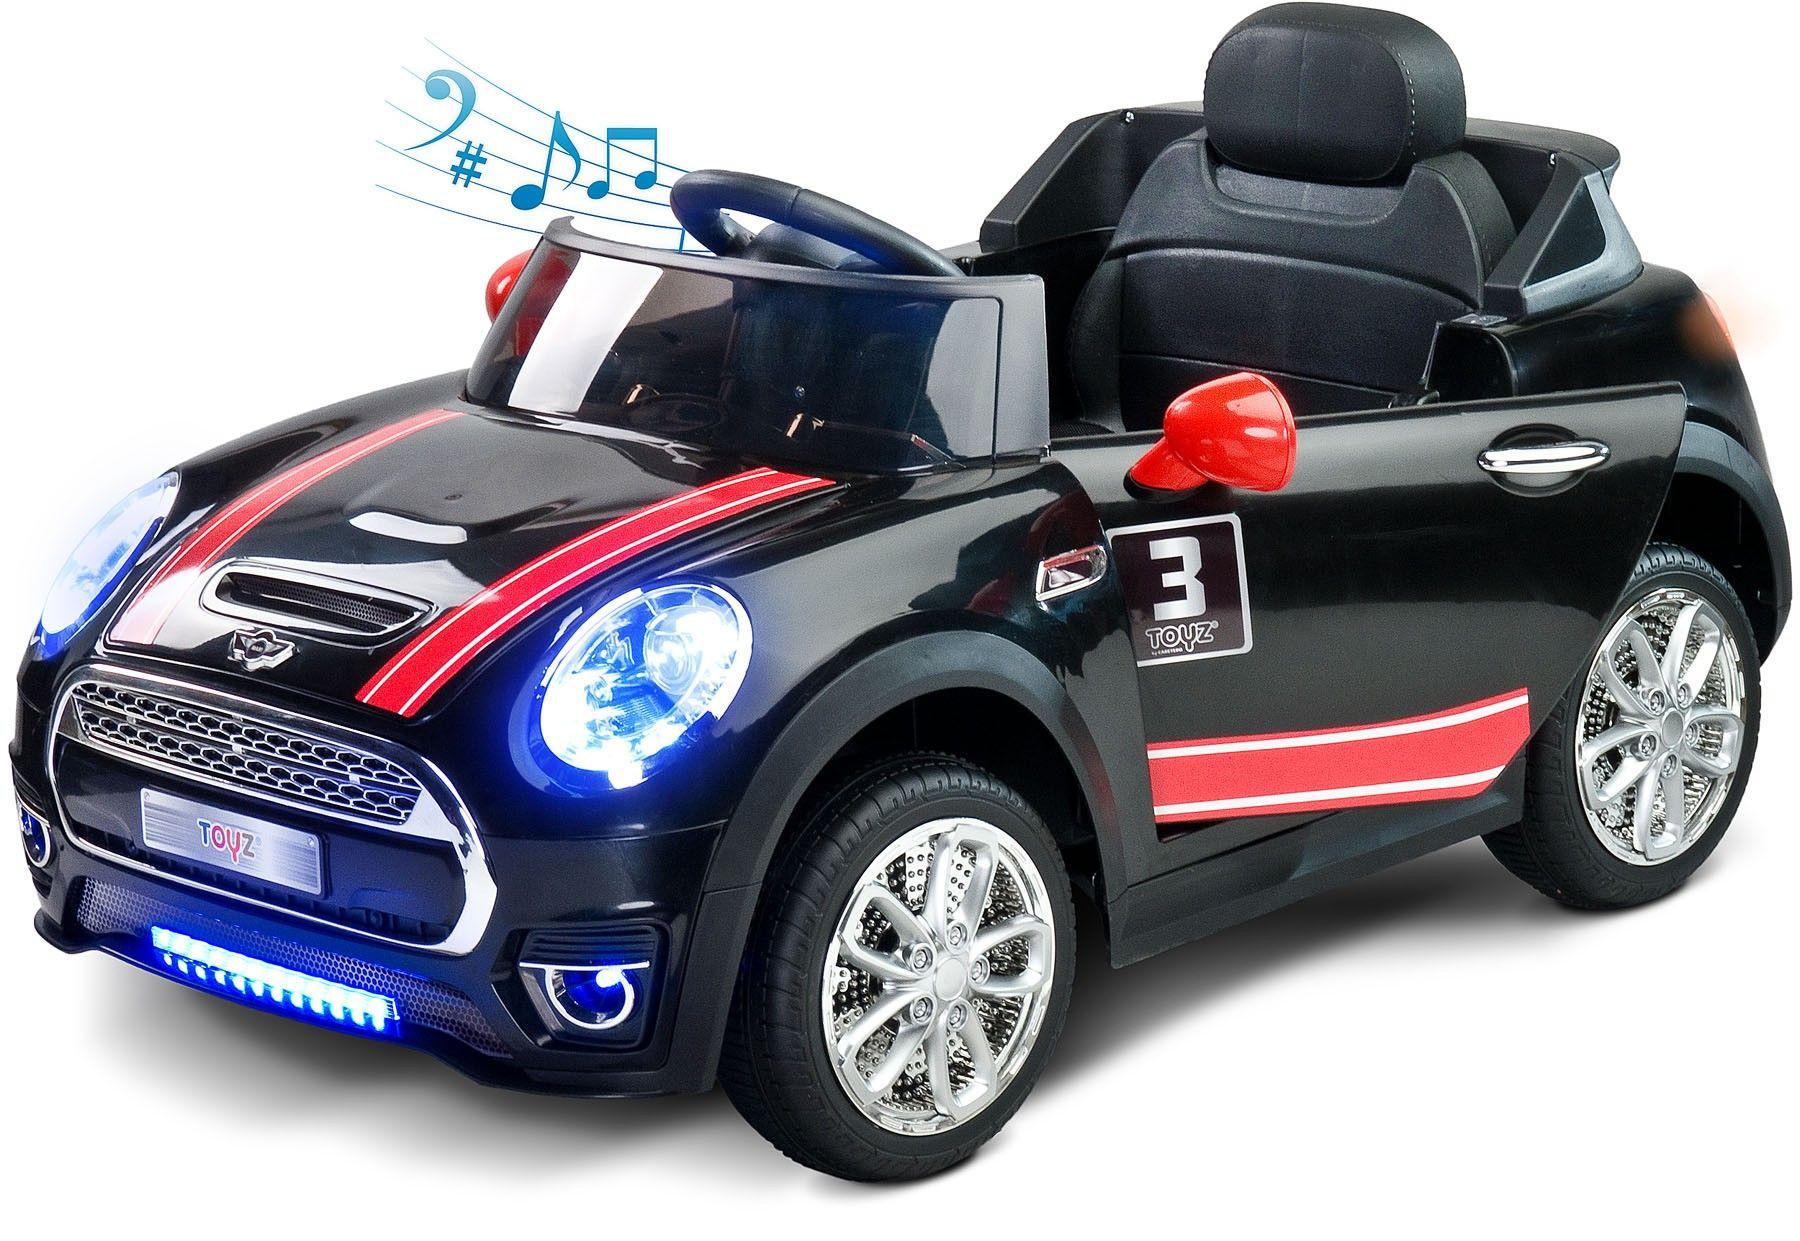 Electric rideon car Maxi 12V black with remote control